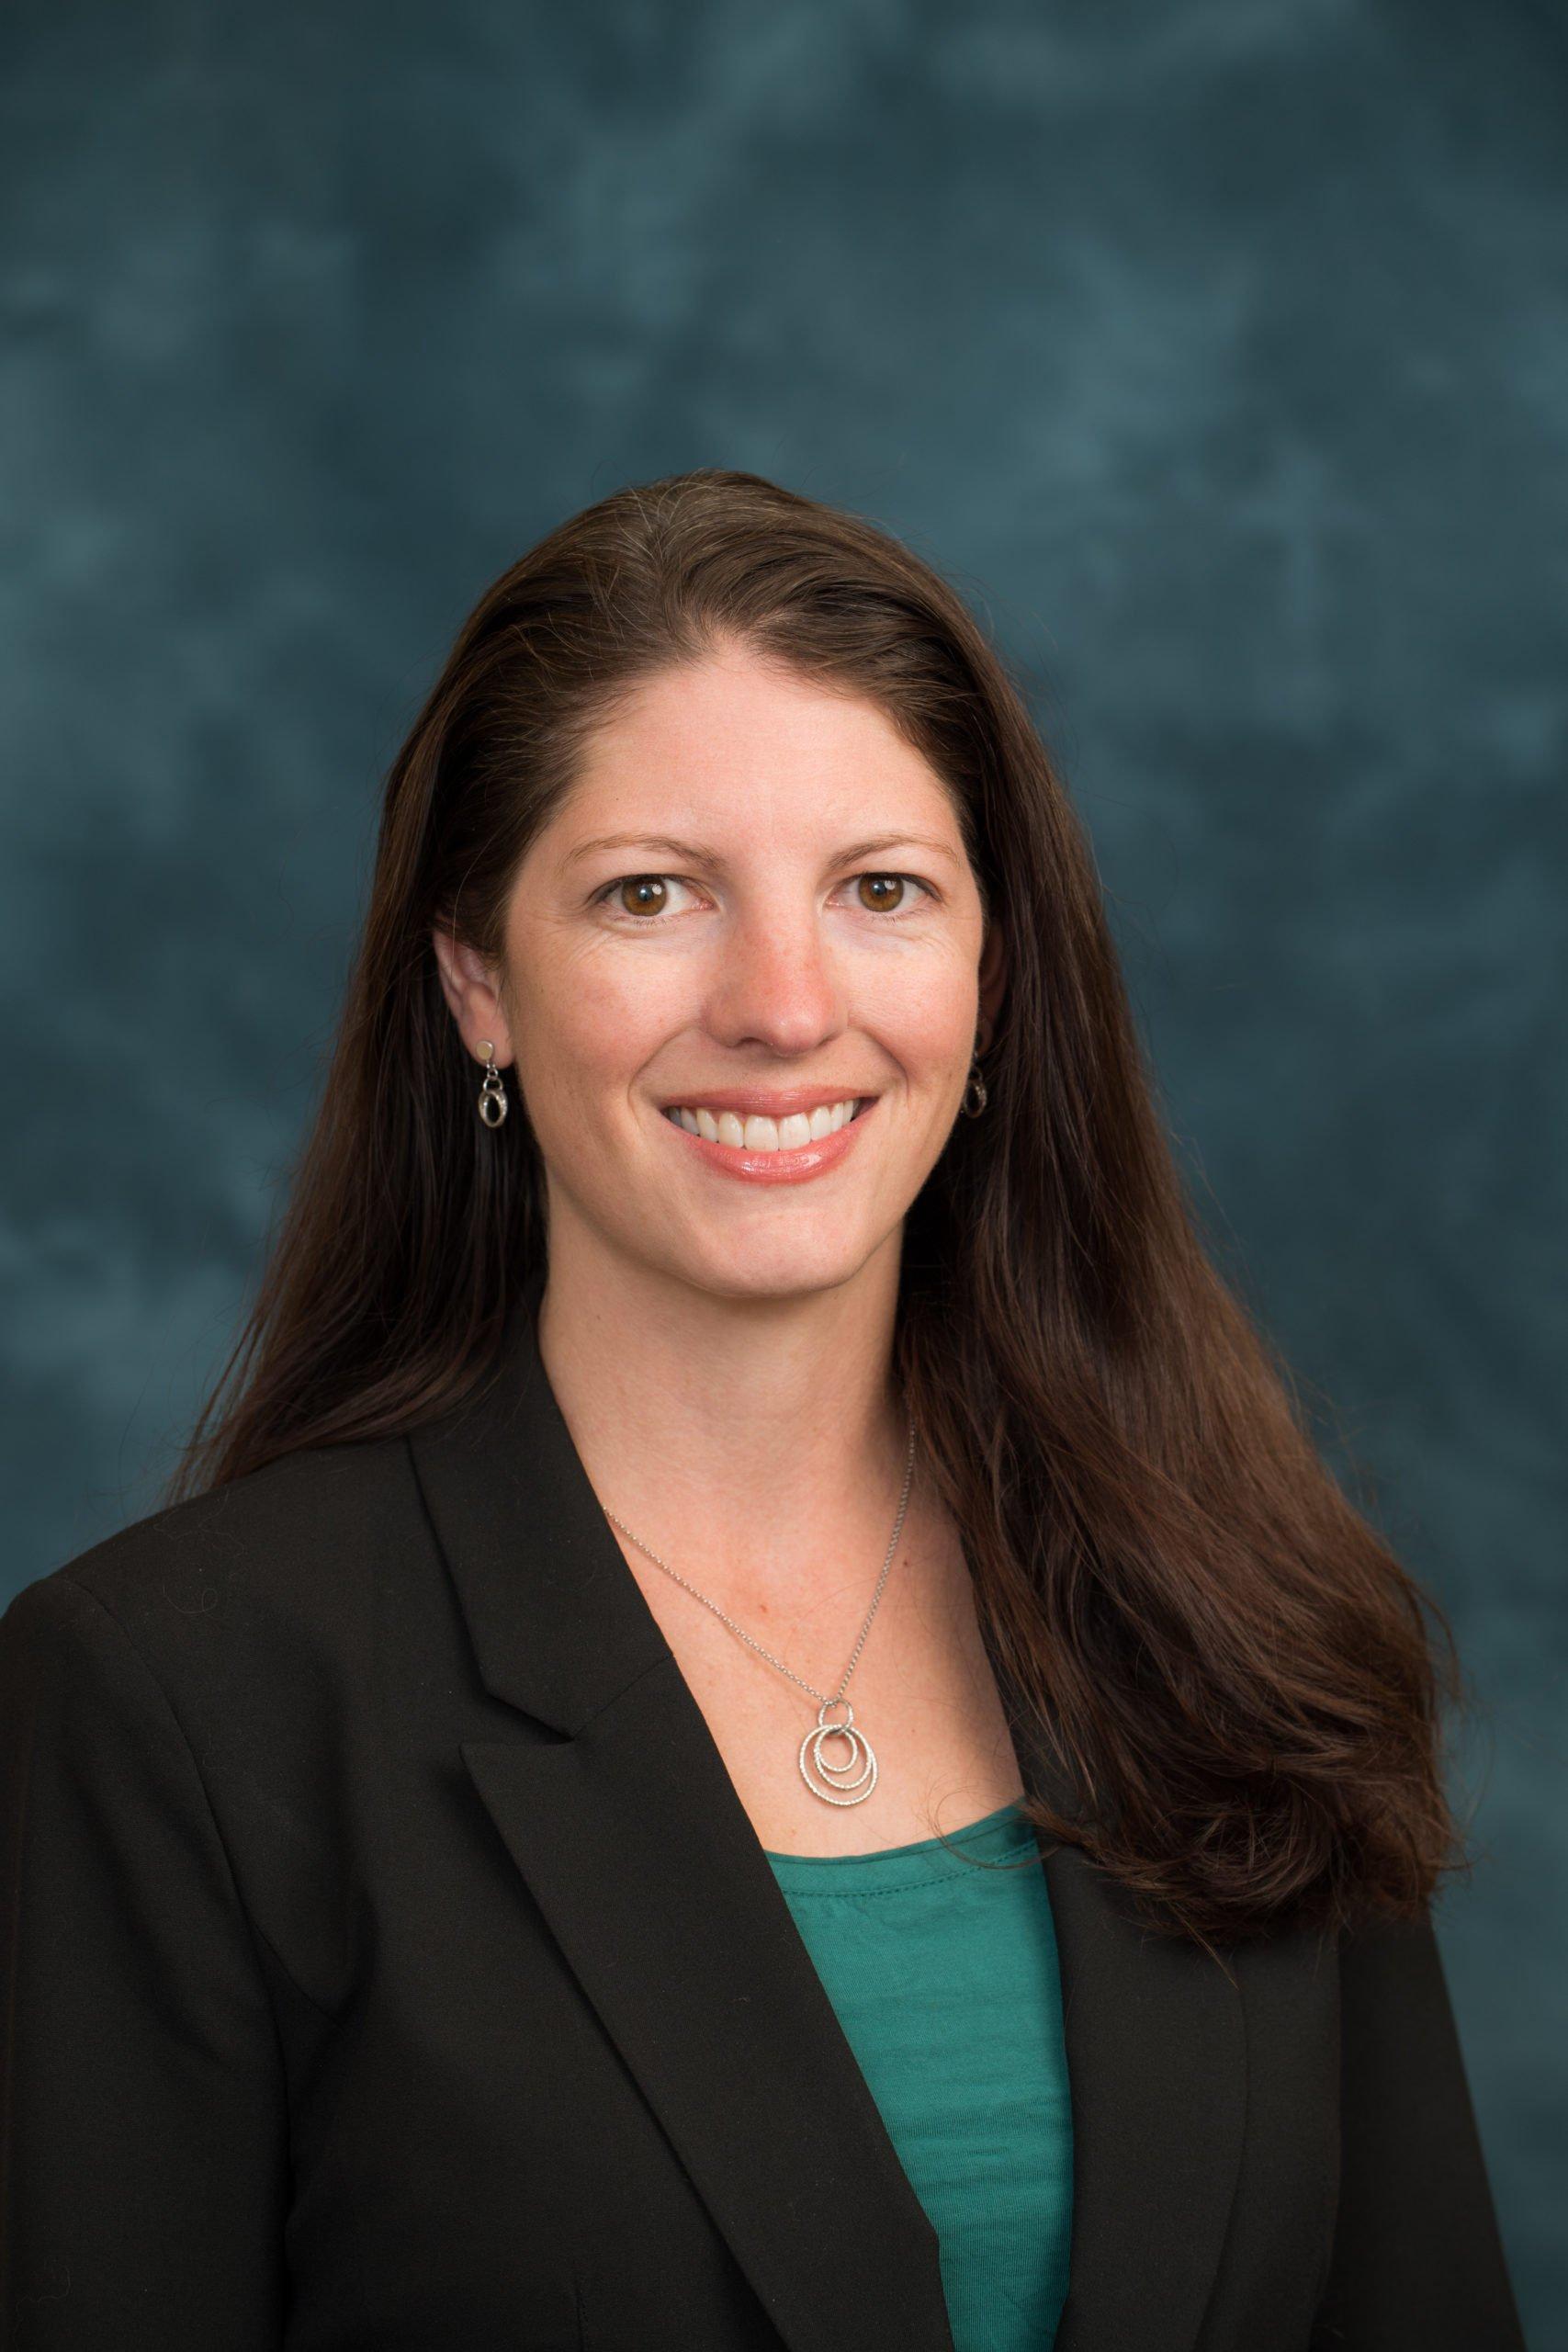 Angela Beck, PhD, MPH